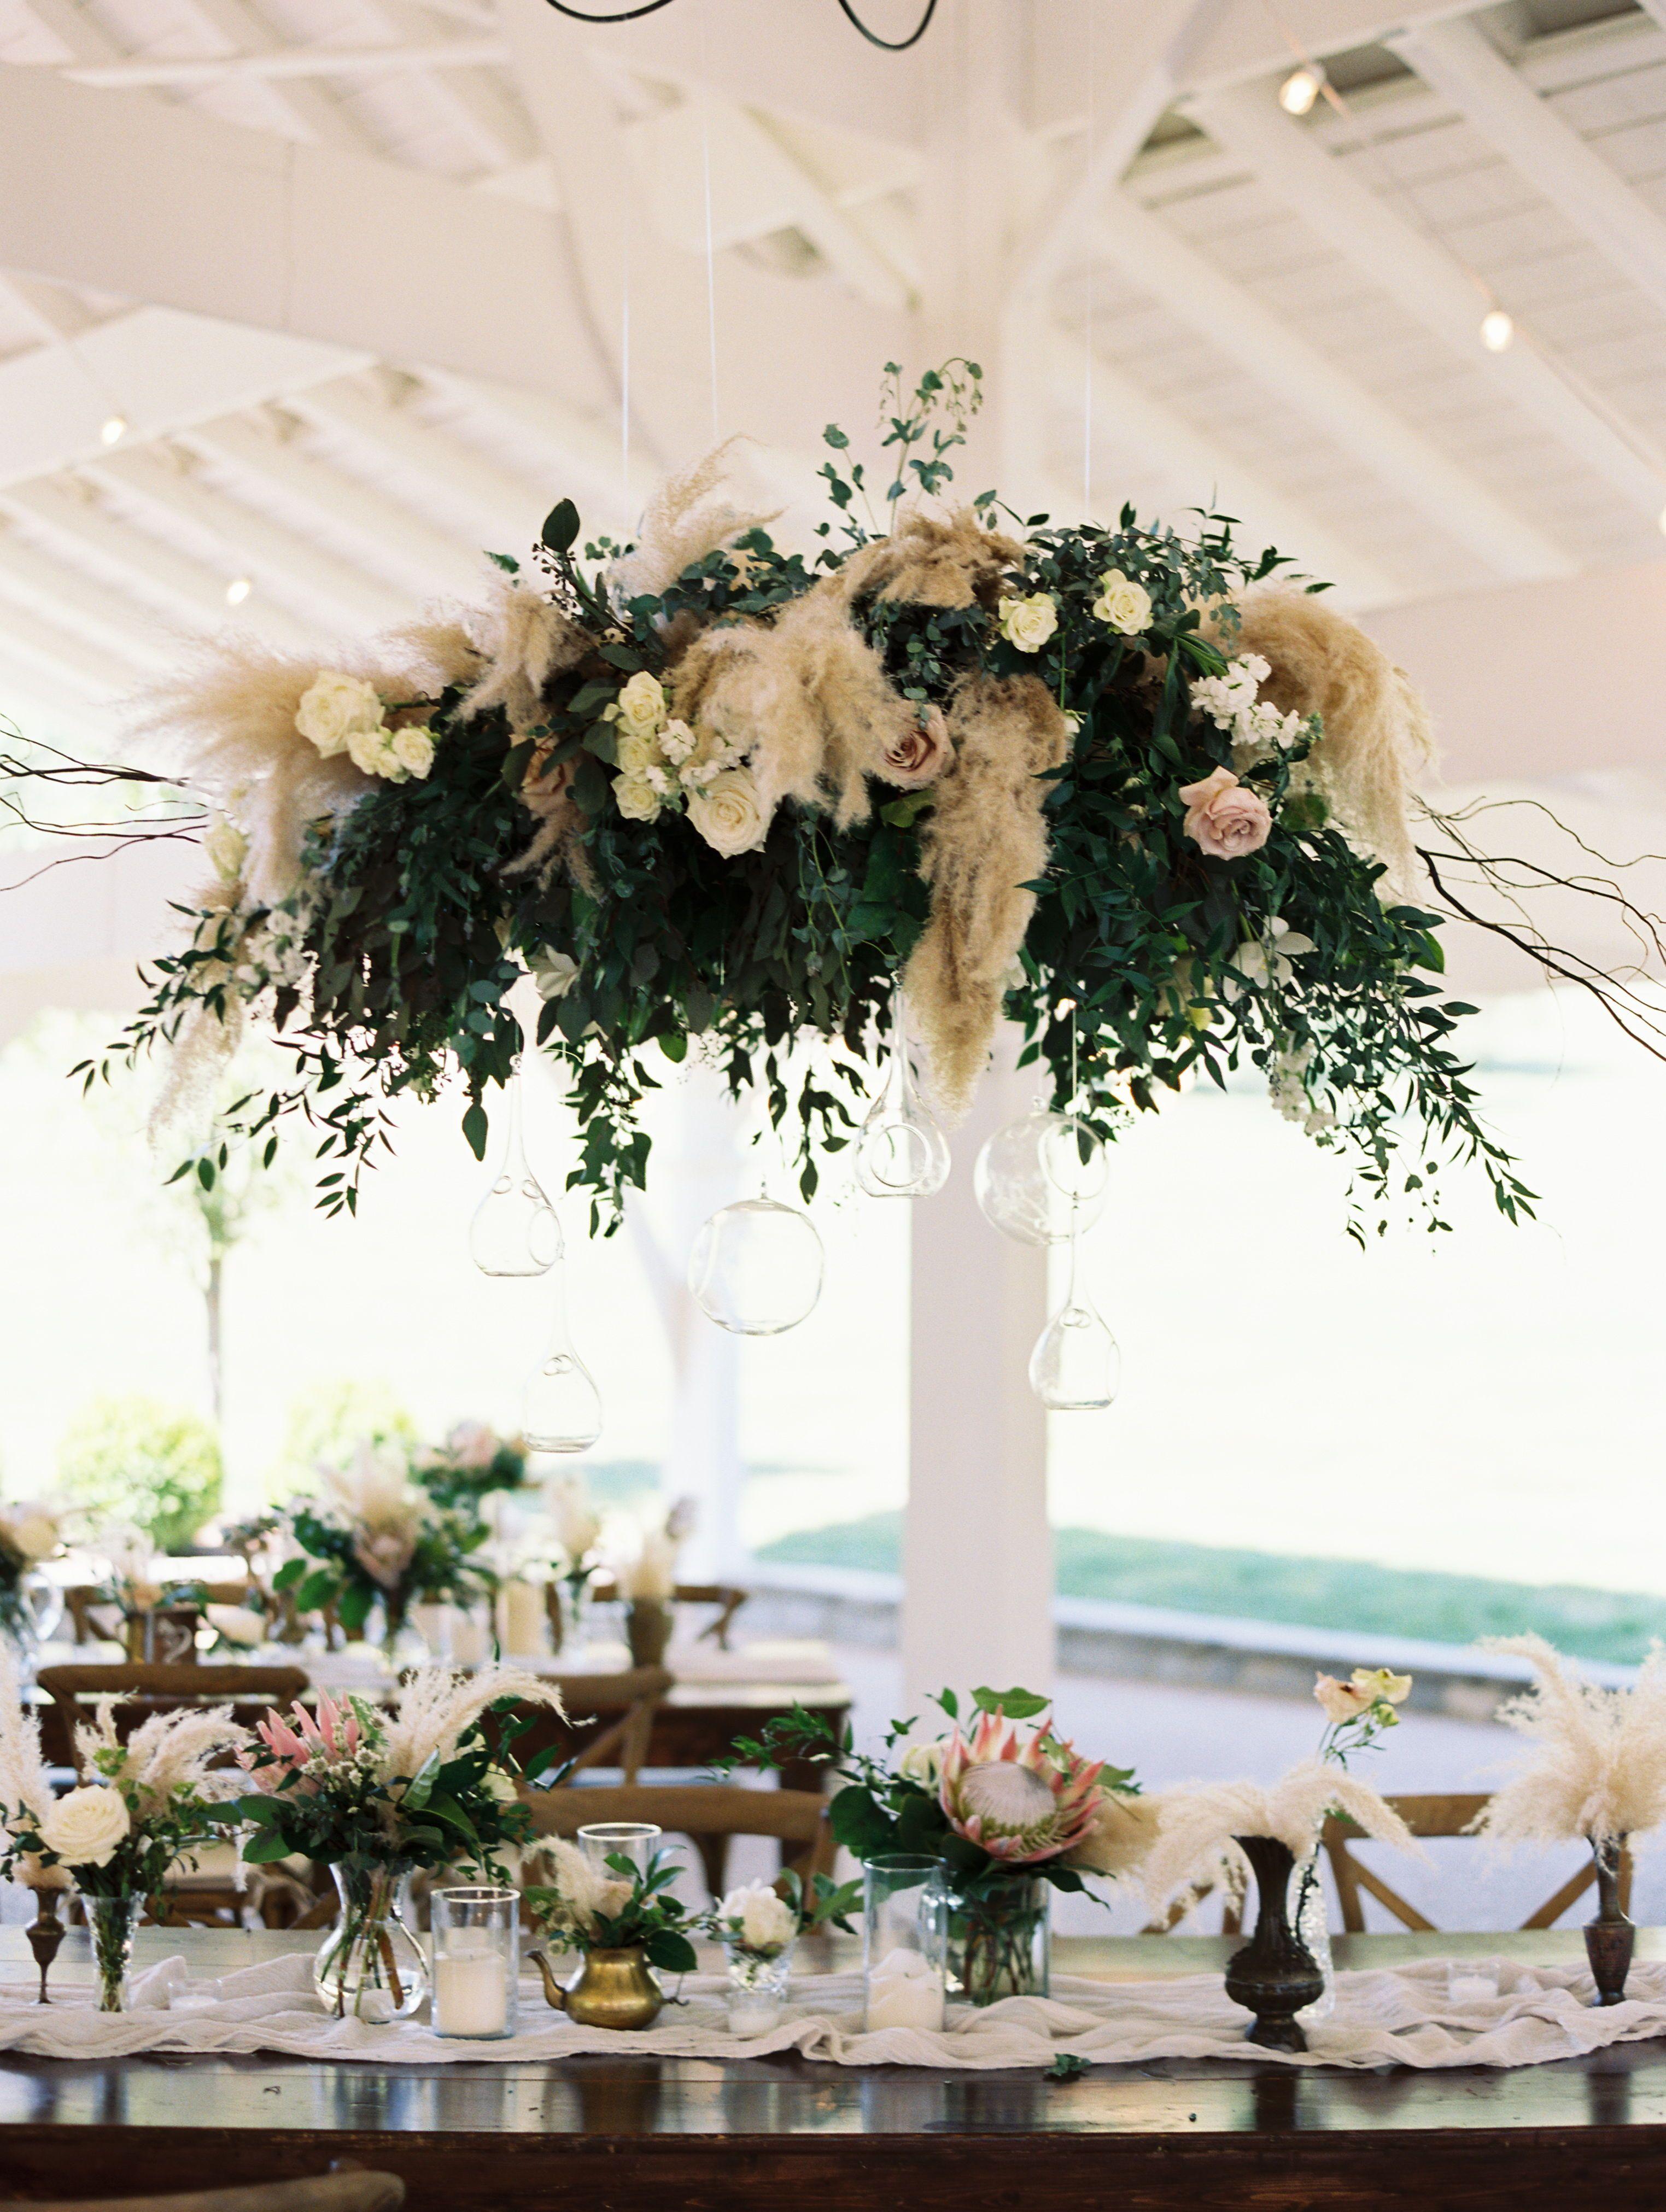 Romantic Floral Decorations for Reception Tables